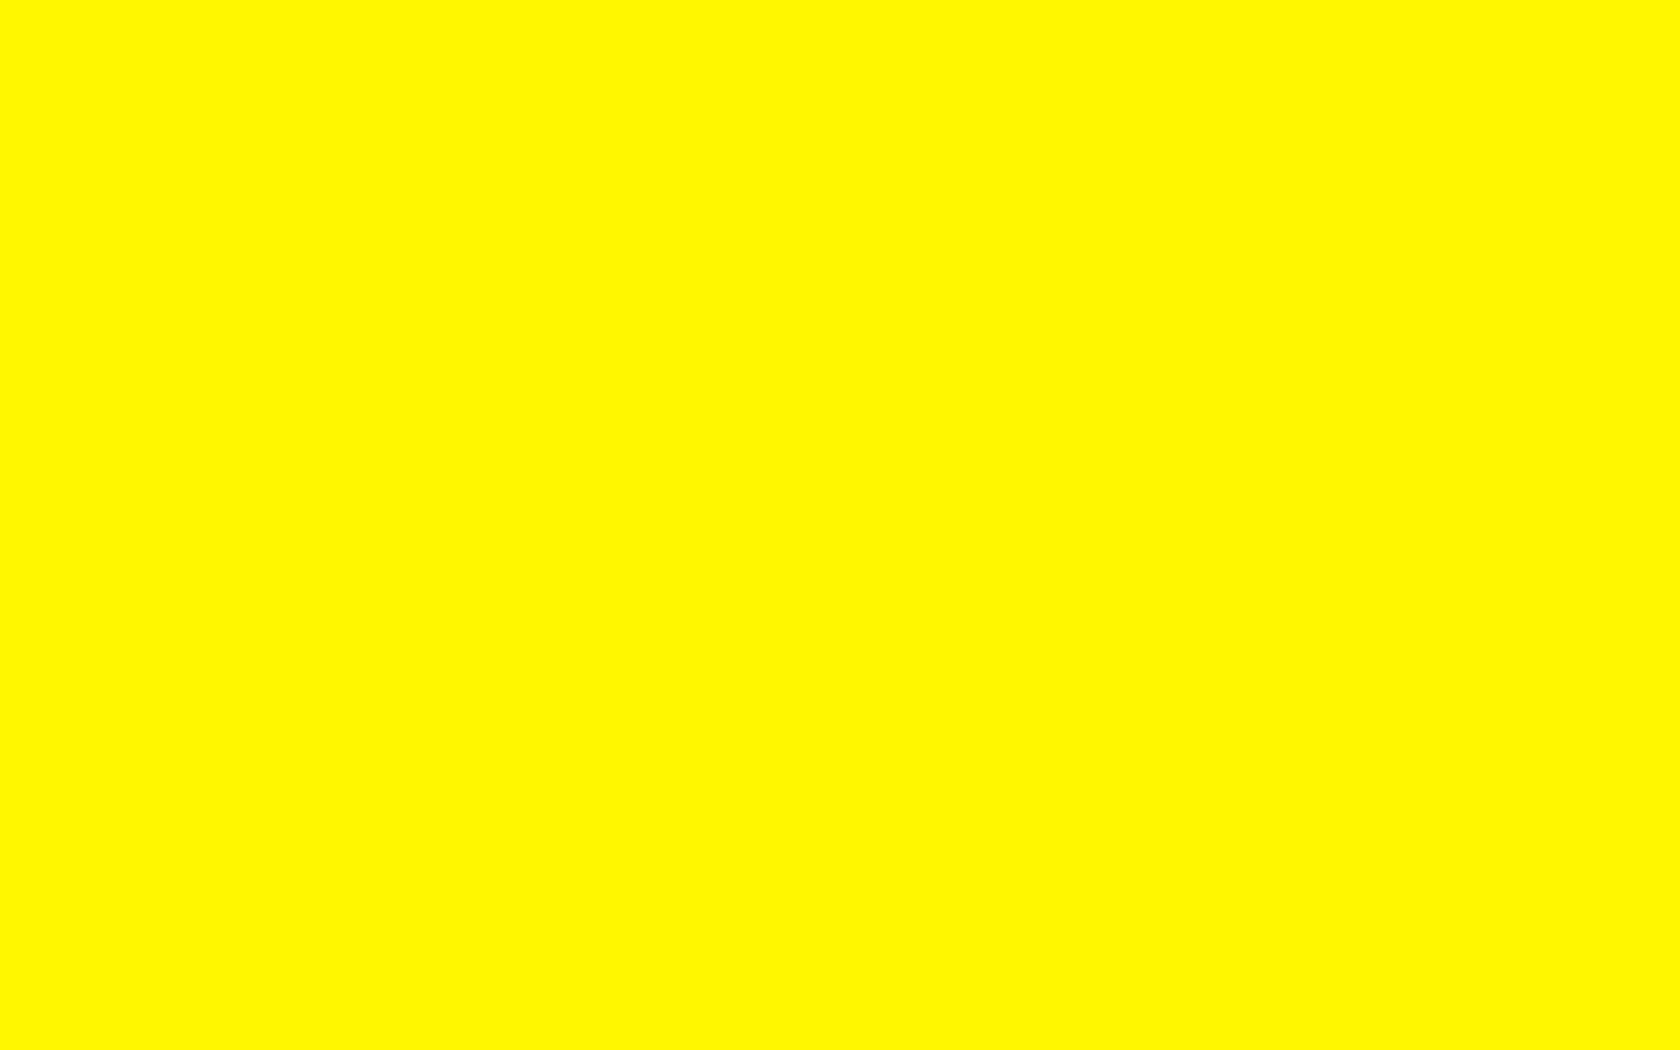 1680x1050 Lemon Solid Color Background